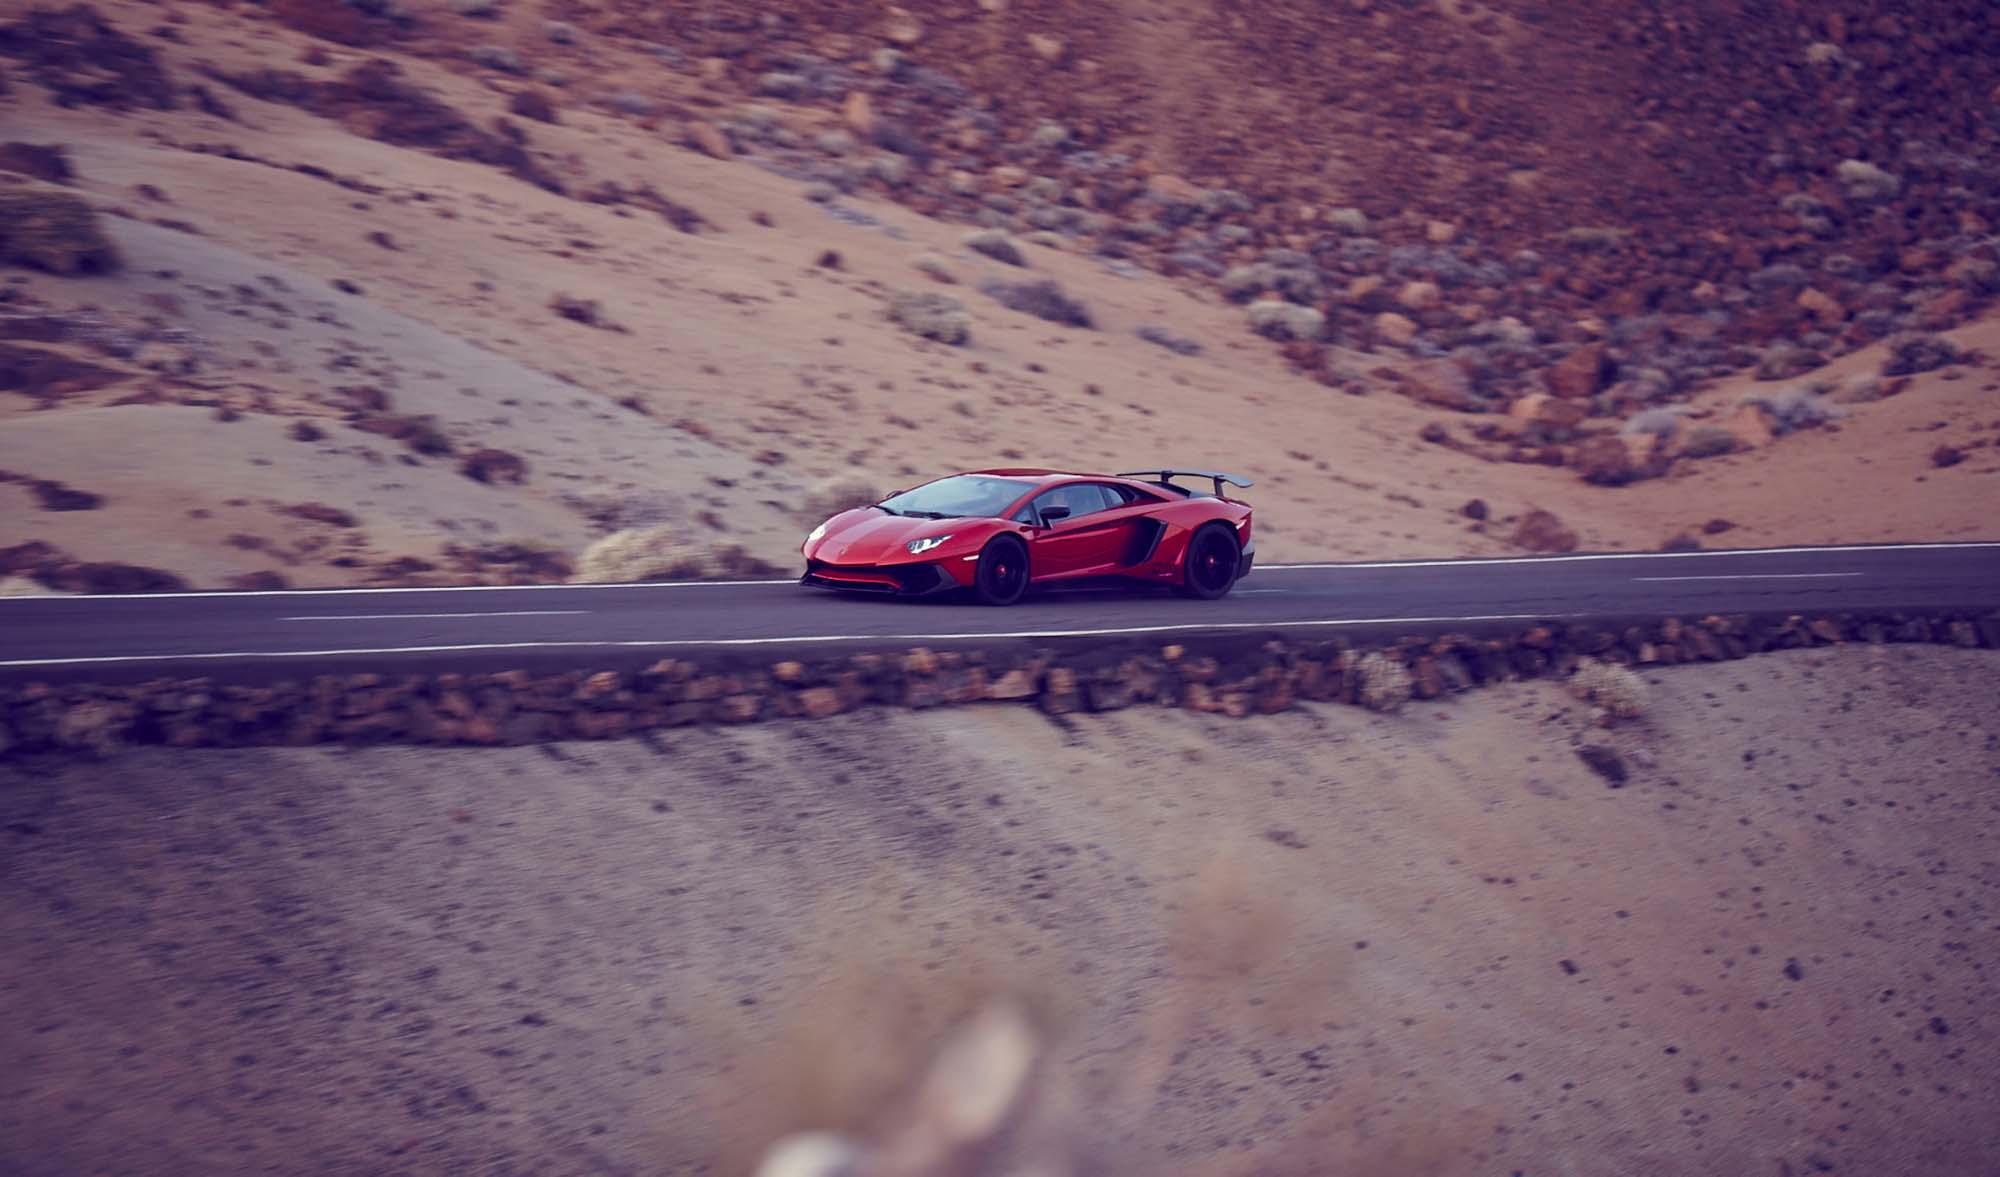 Lamborghini by Jan van Endert